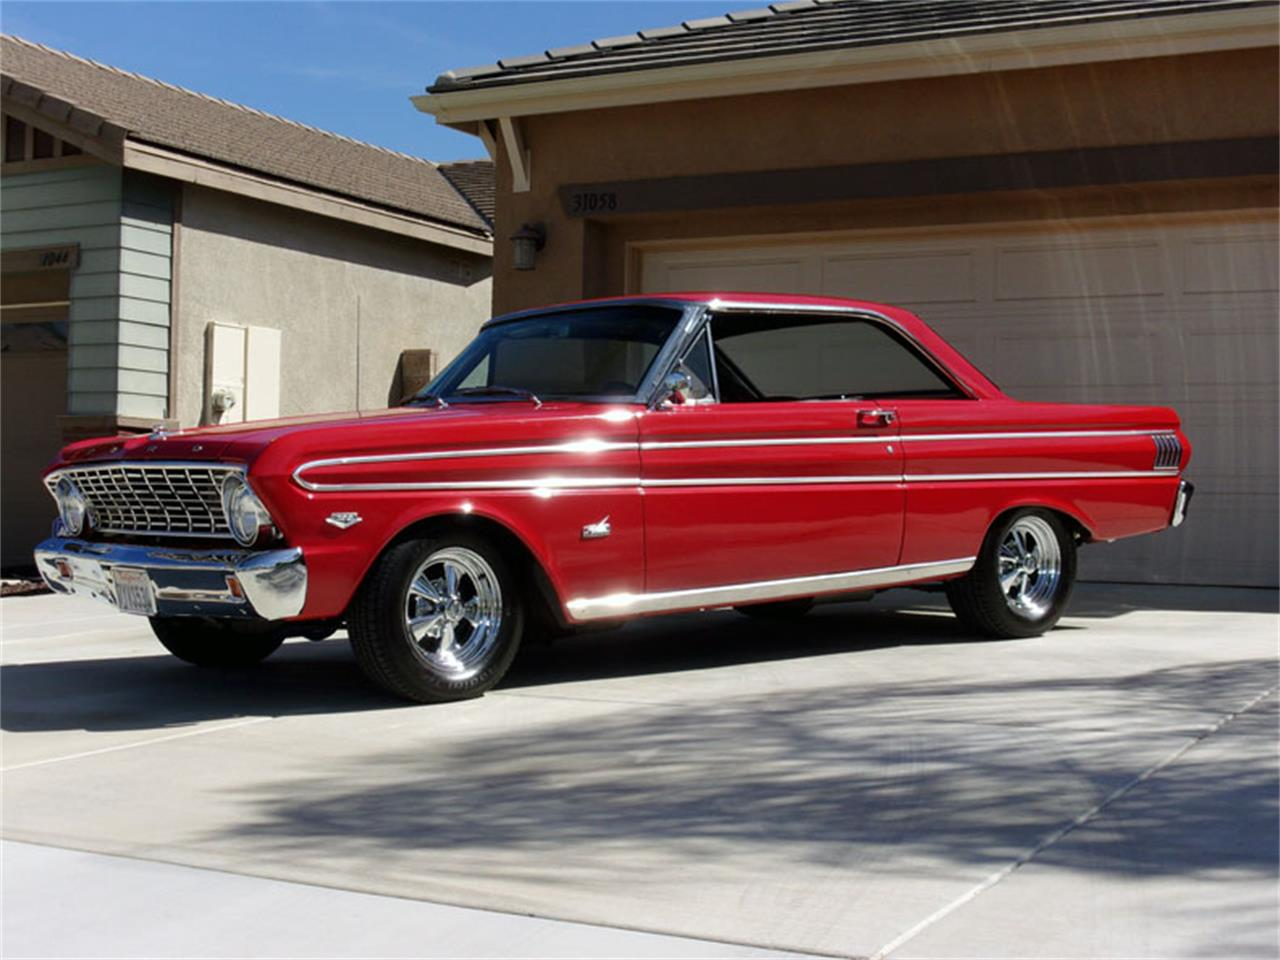 9884409-1964-ford-falcon-futura-std.jpg